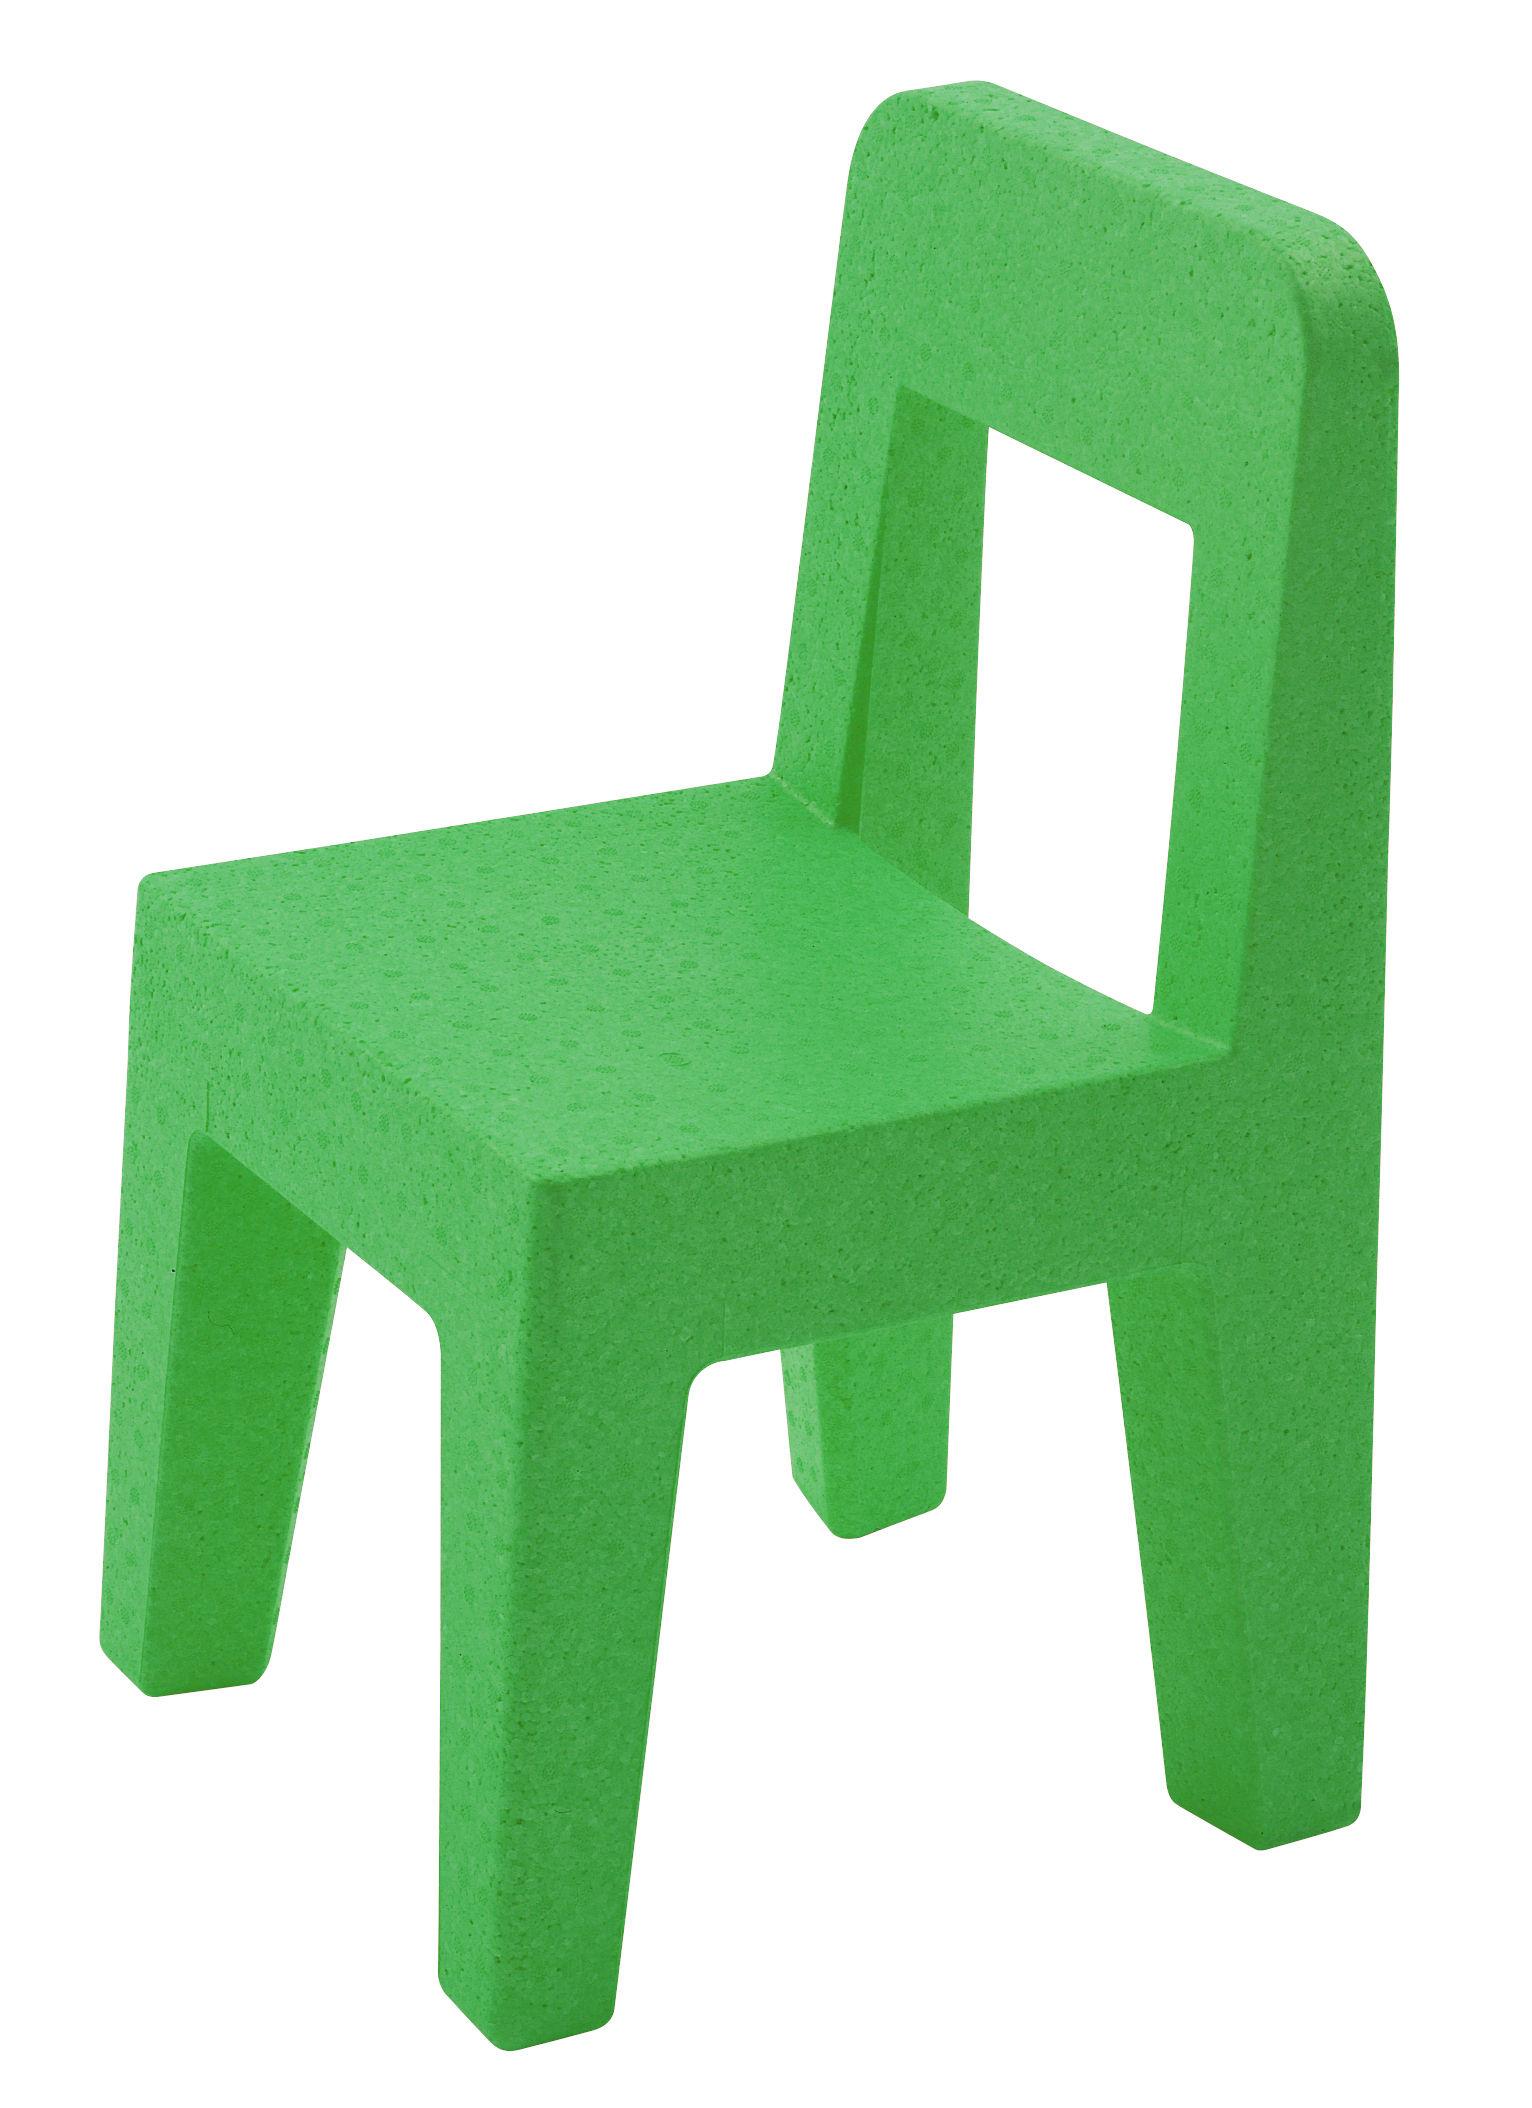 Mobilier - Mobilier Kids - Chaise enfant Seggiolina Pop - Magis Collection Me Too - Vert - Polypropylène